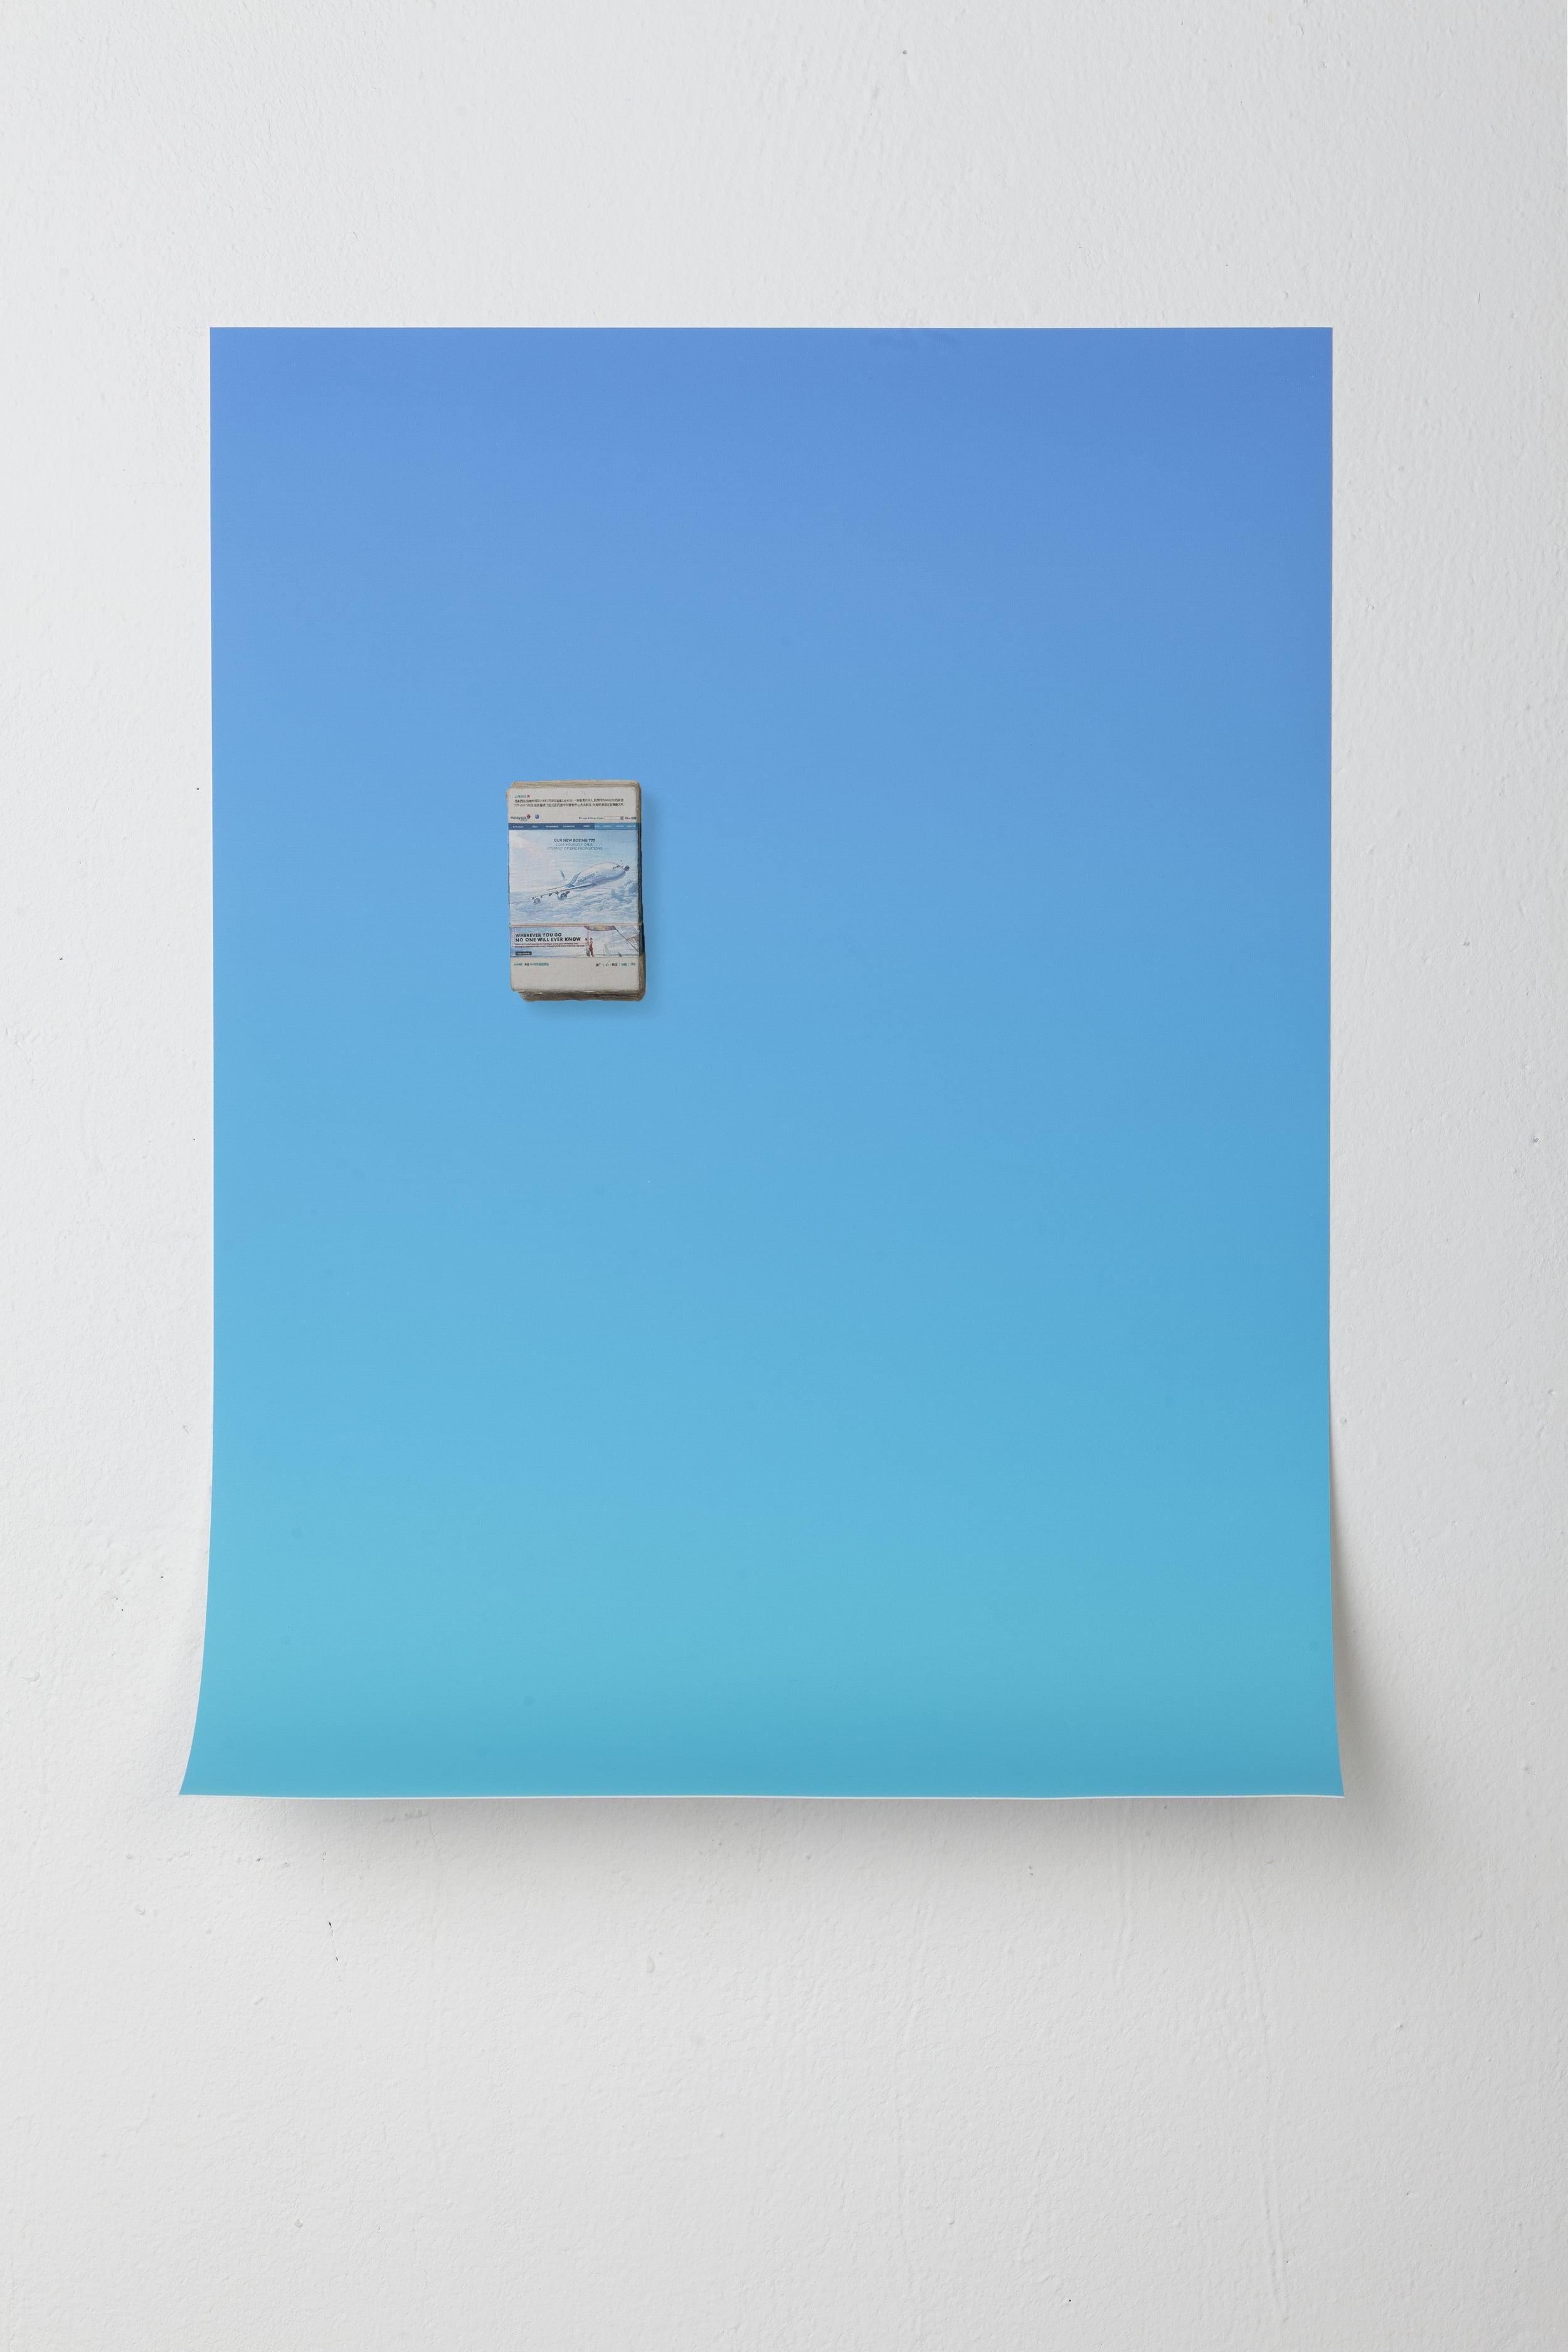 Liu Ren 刘任, Disappreance 失踪, 2014, Oil on straw paper 草纸油画, 17 x 27 x 10.5 cm